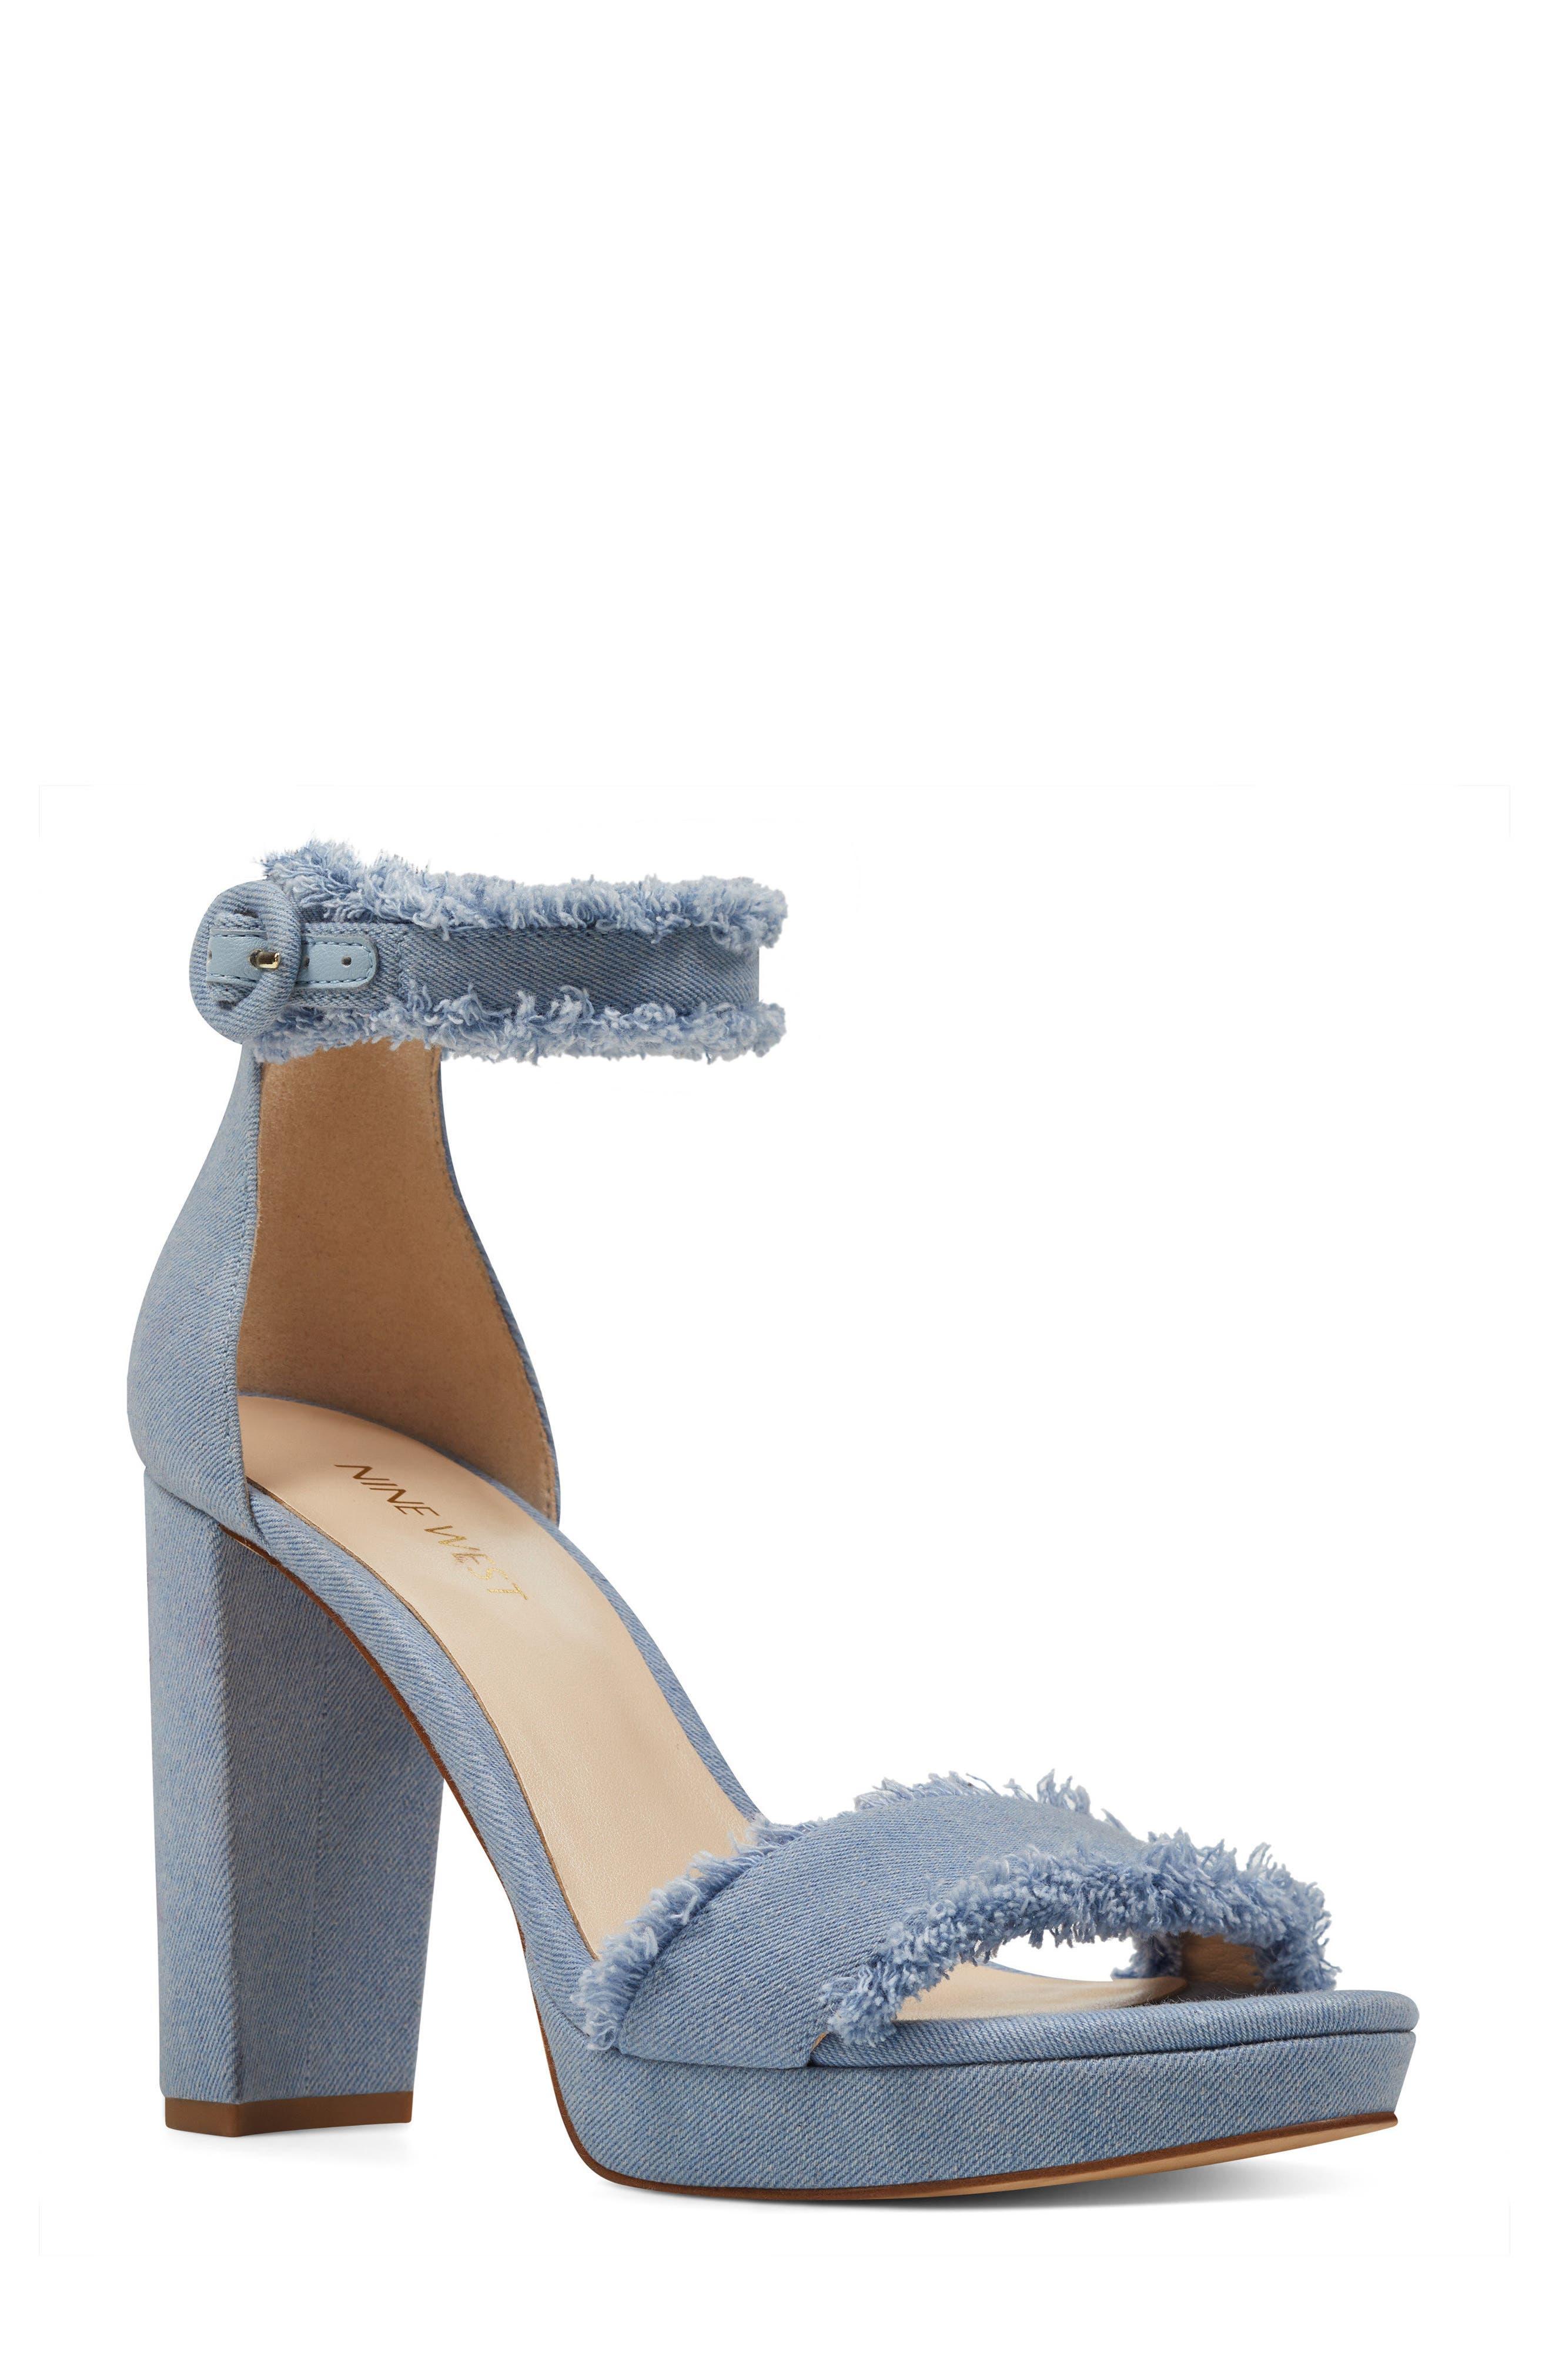 Main Image - Nine West Daranita Ankle Strap Sandal (Women)